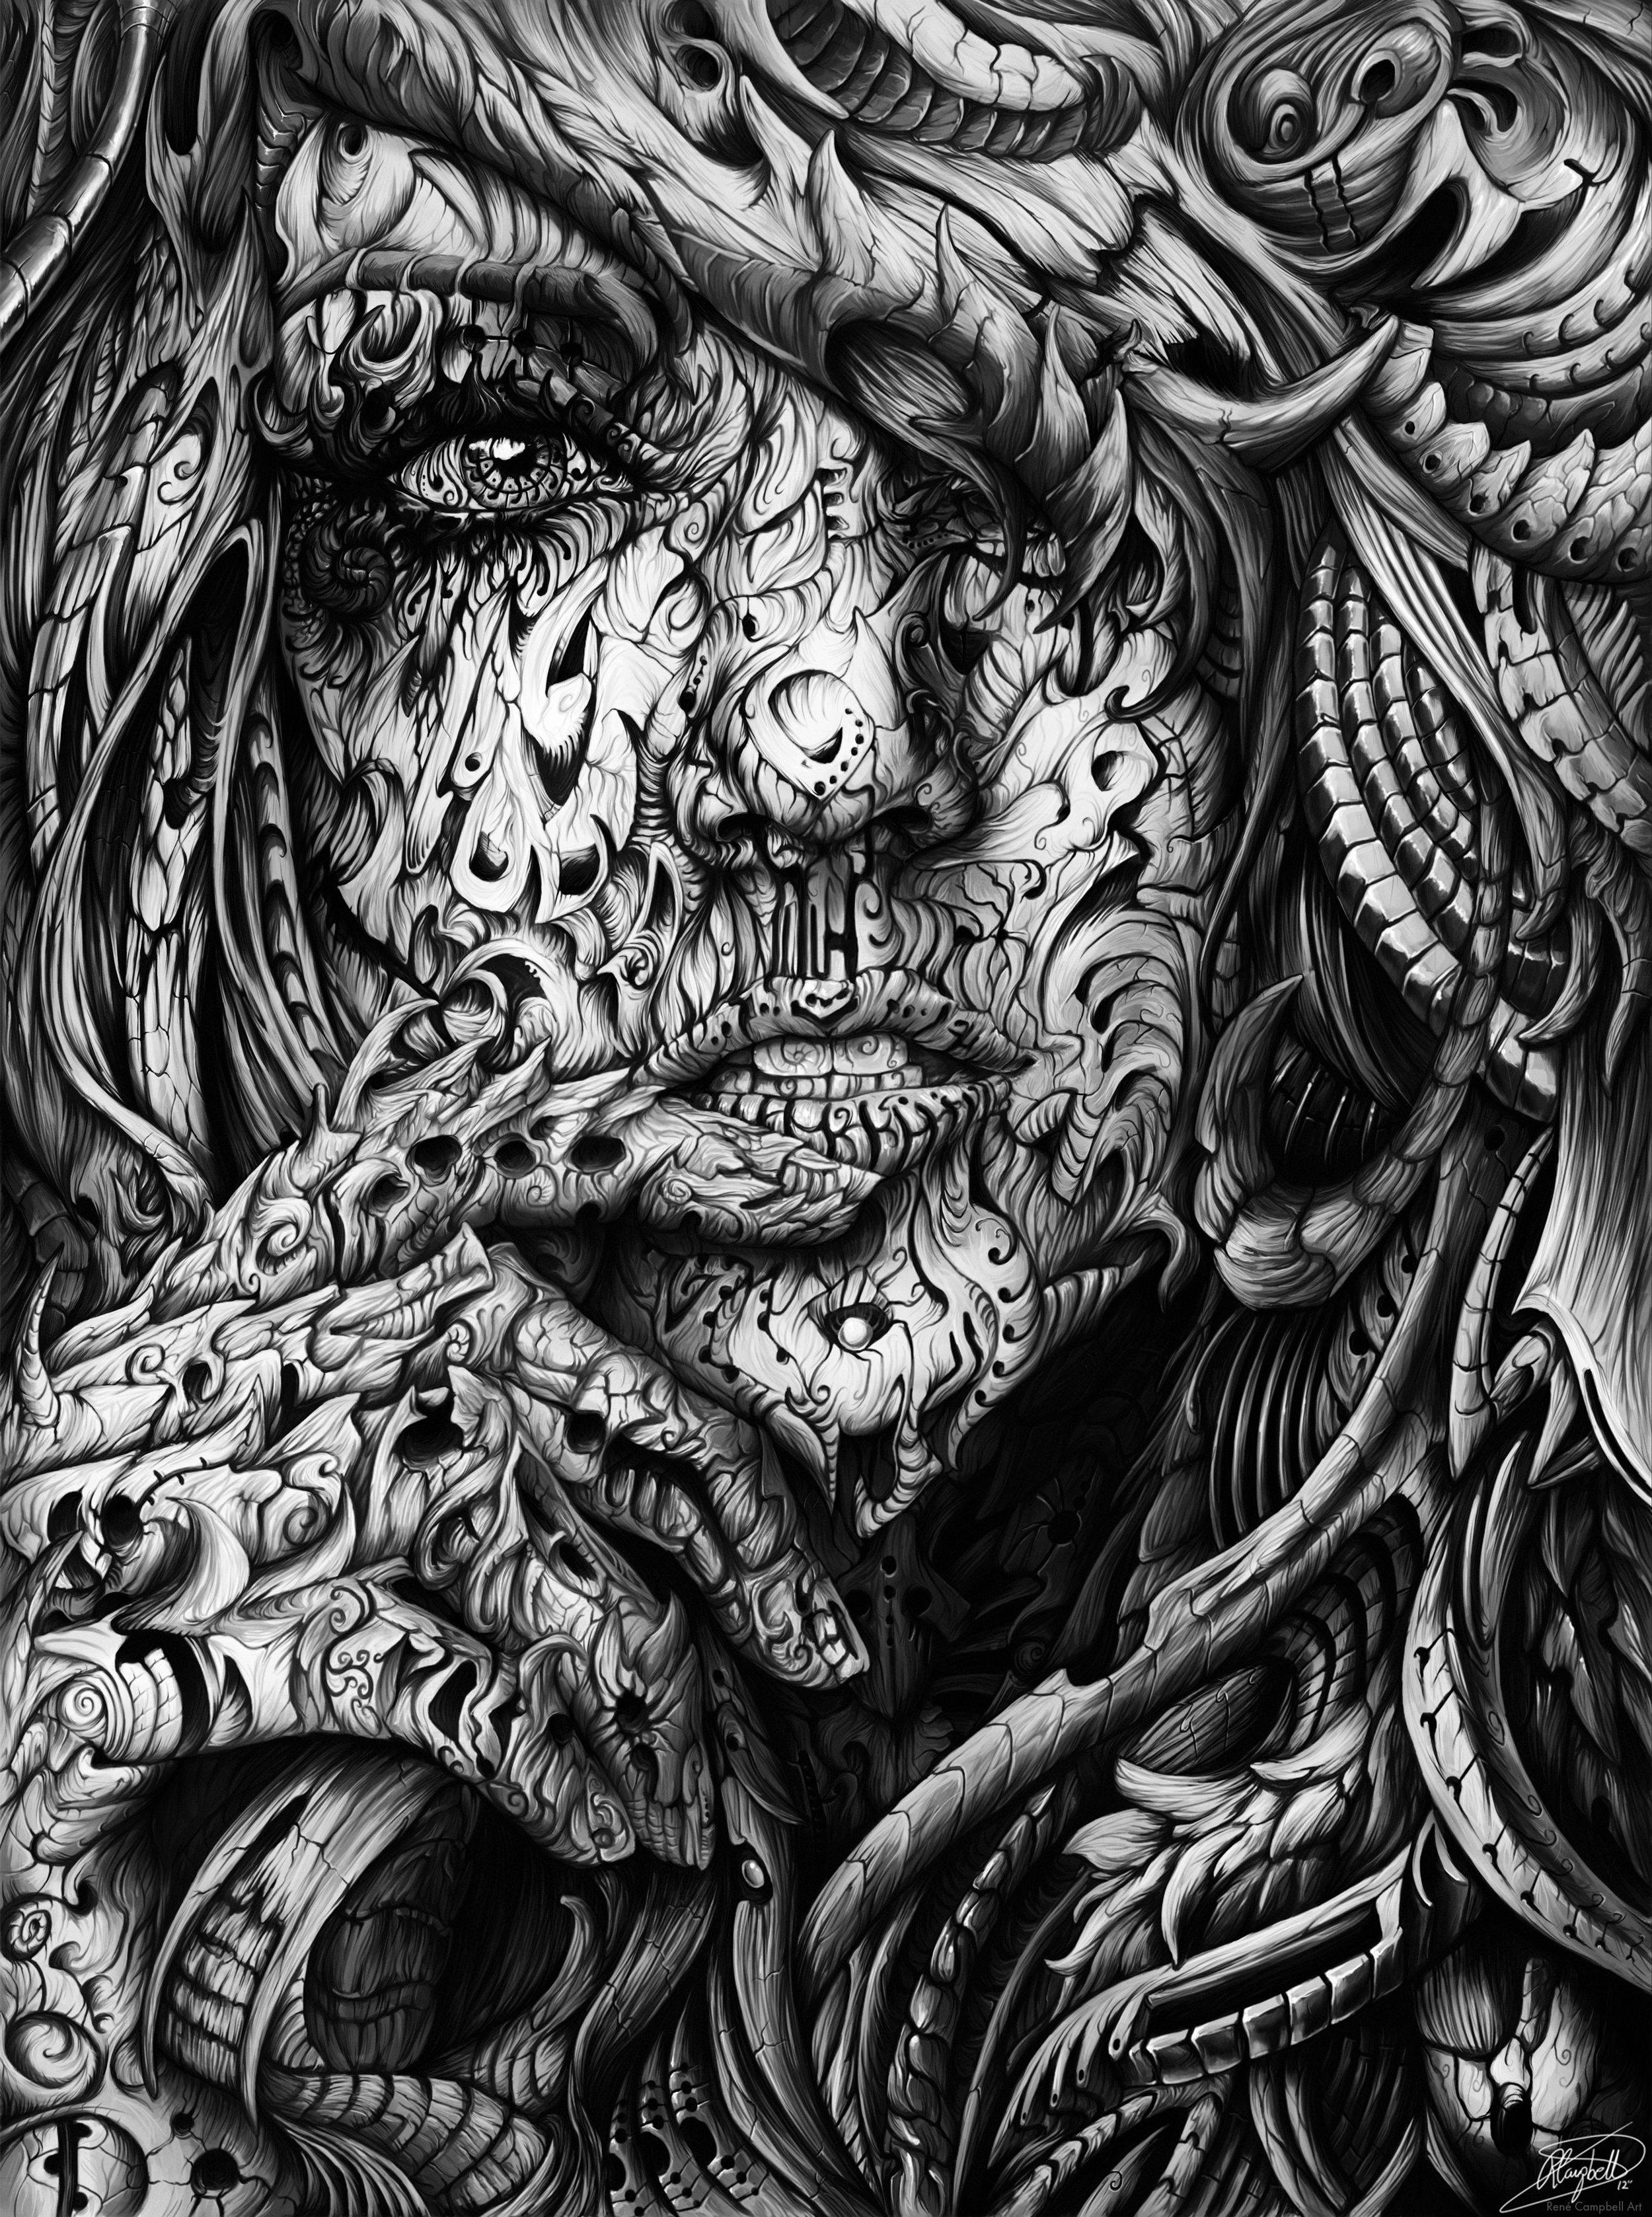 High Detail Digital Portrait: ~$400 +